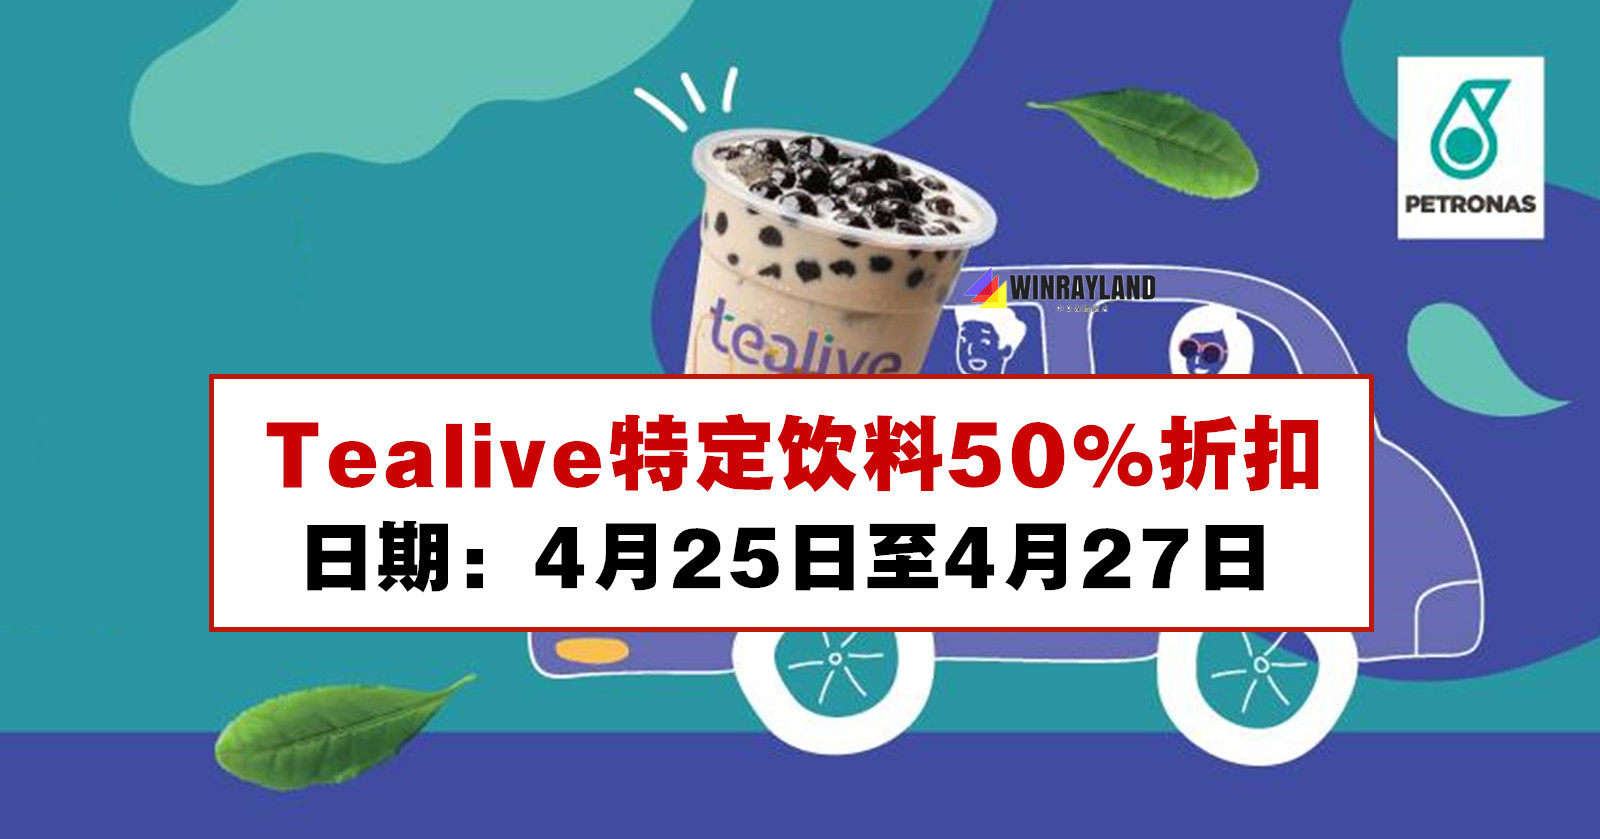 Tealive特定饮料50%折扣